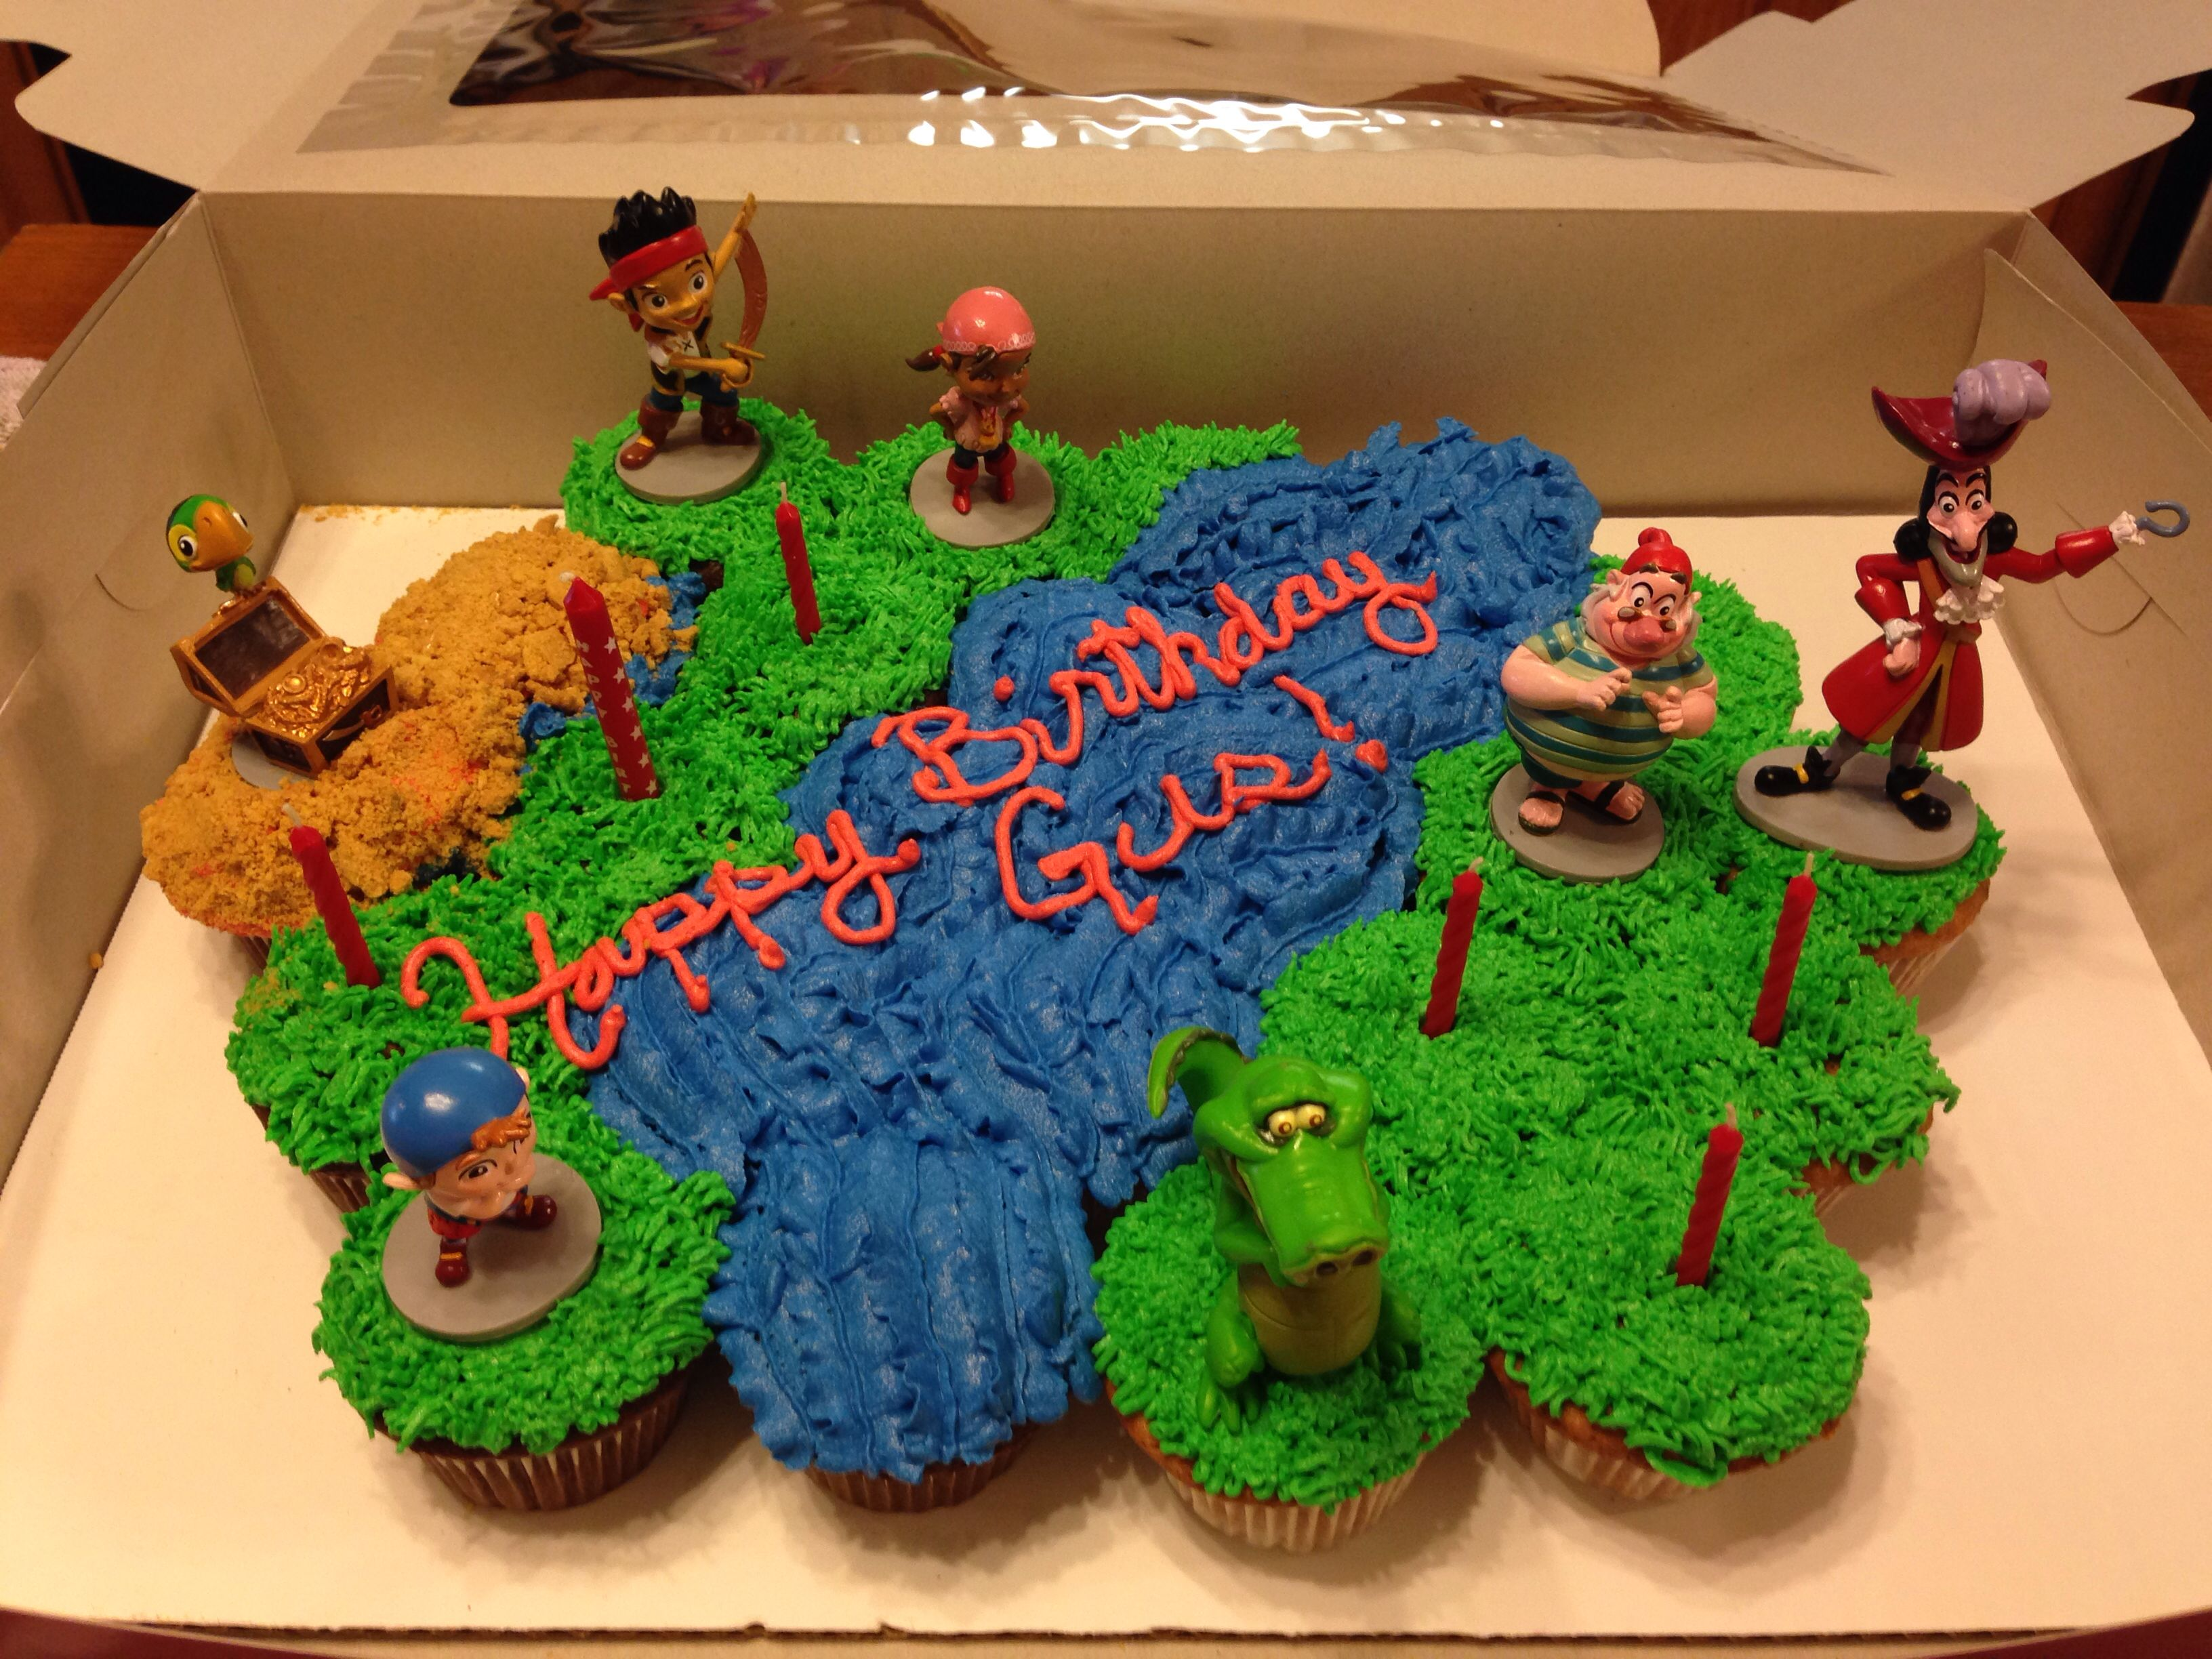 Jake and the Neverland Pirates cupcake cake Homemade Buttercream